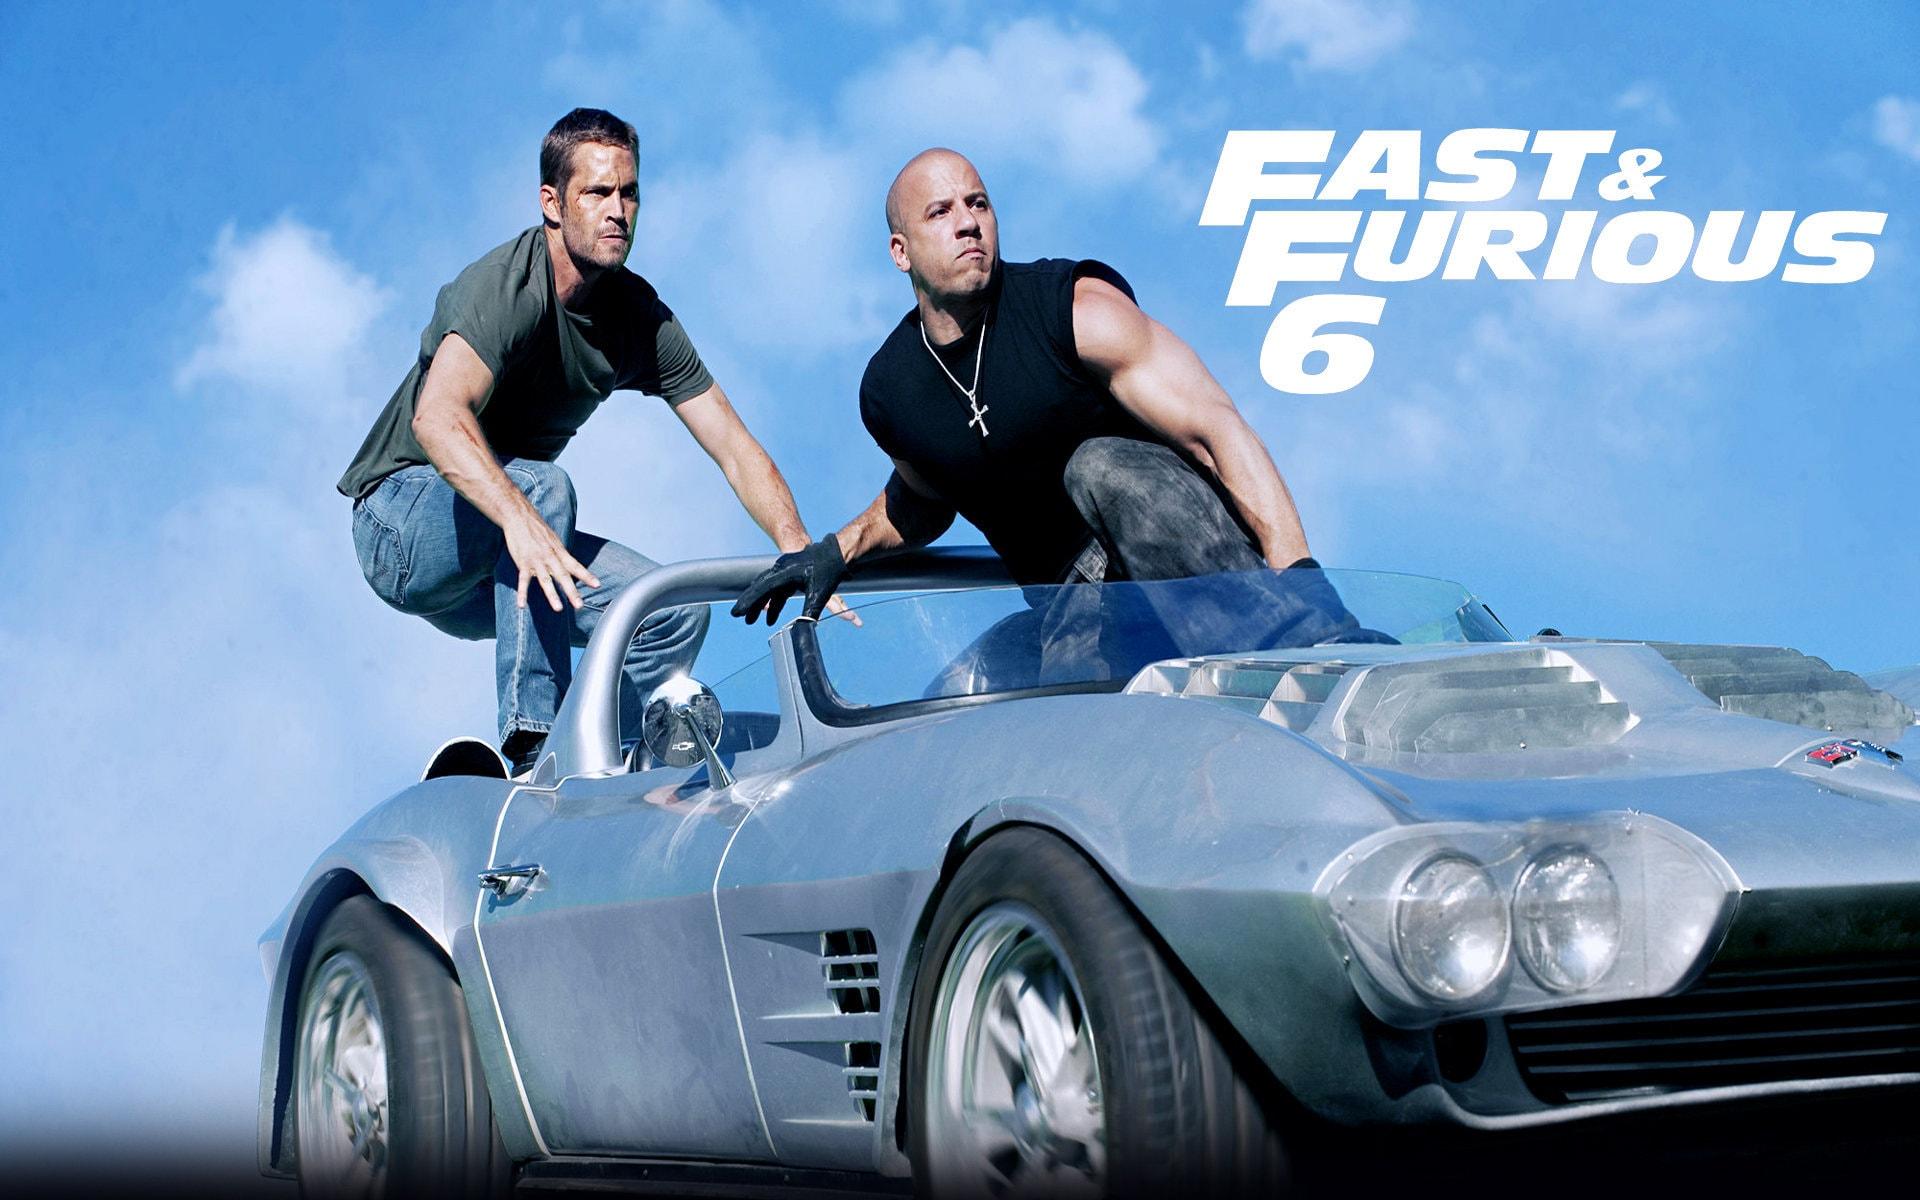 Fast & Furious 6 Wallpaper